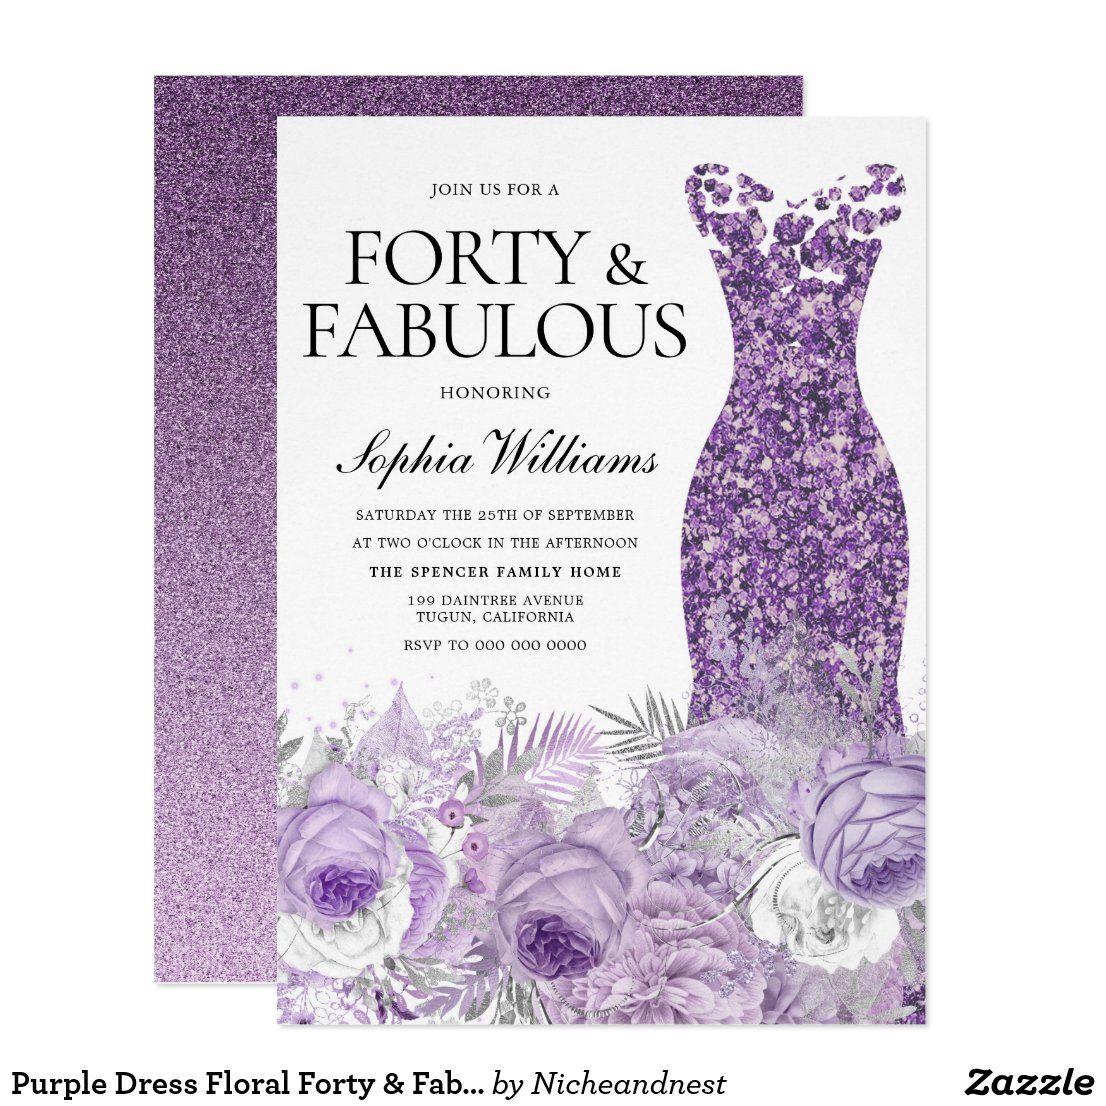 Purple Dress Floral Forty Fabulous 40th Birthday Invitation Zazzle Com [ 1106 x 1106 Pixel ]